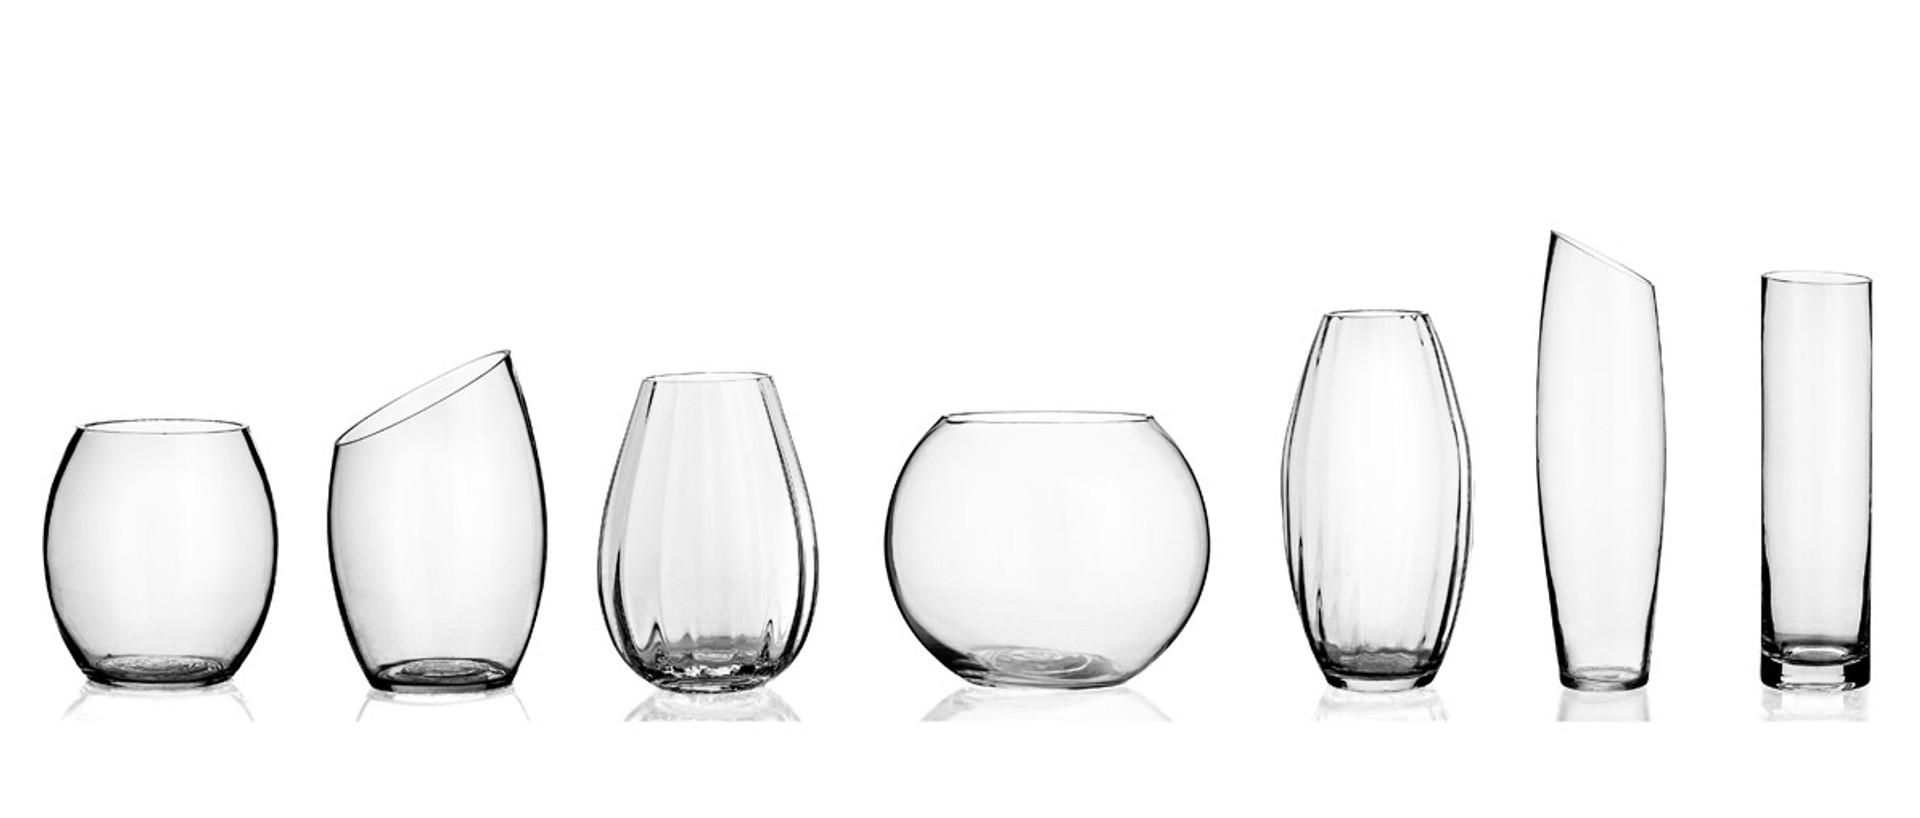 Floral Decor Glass Vases